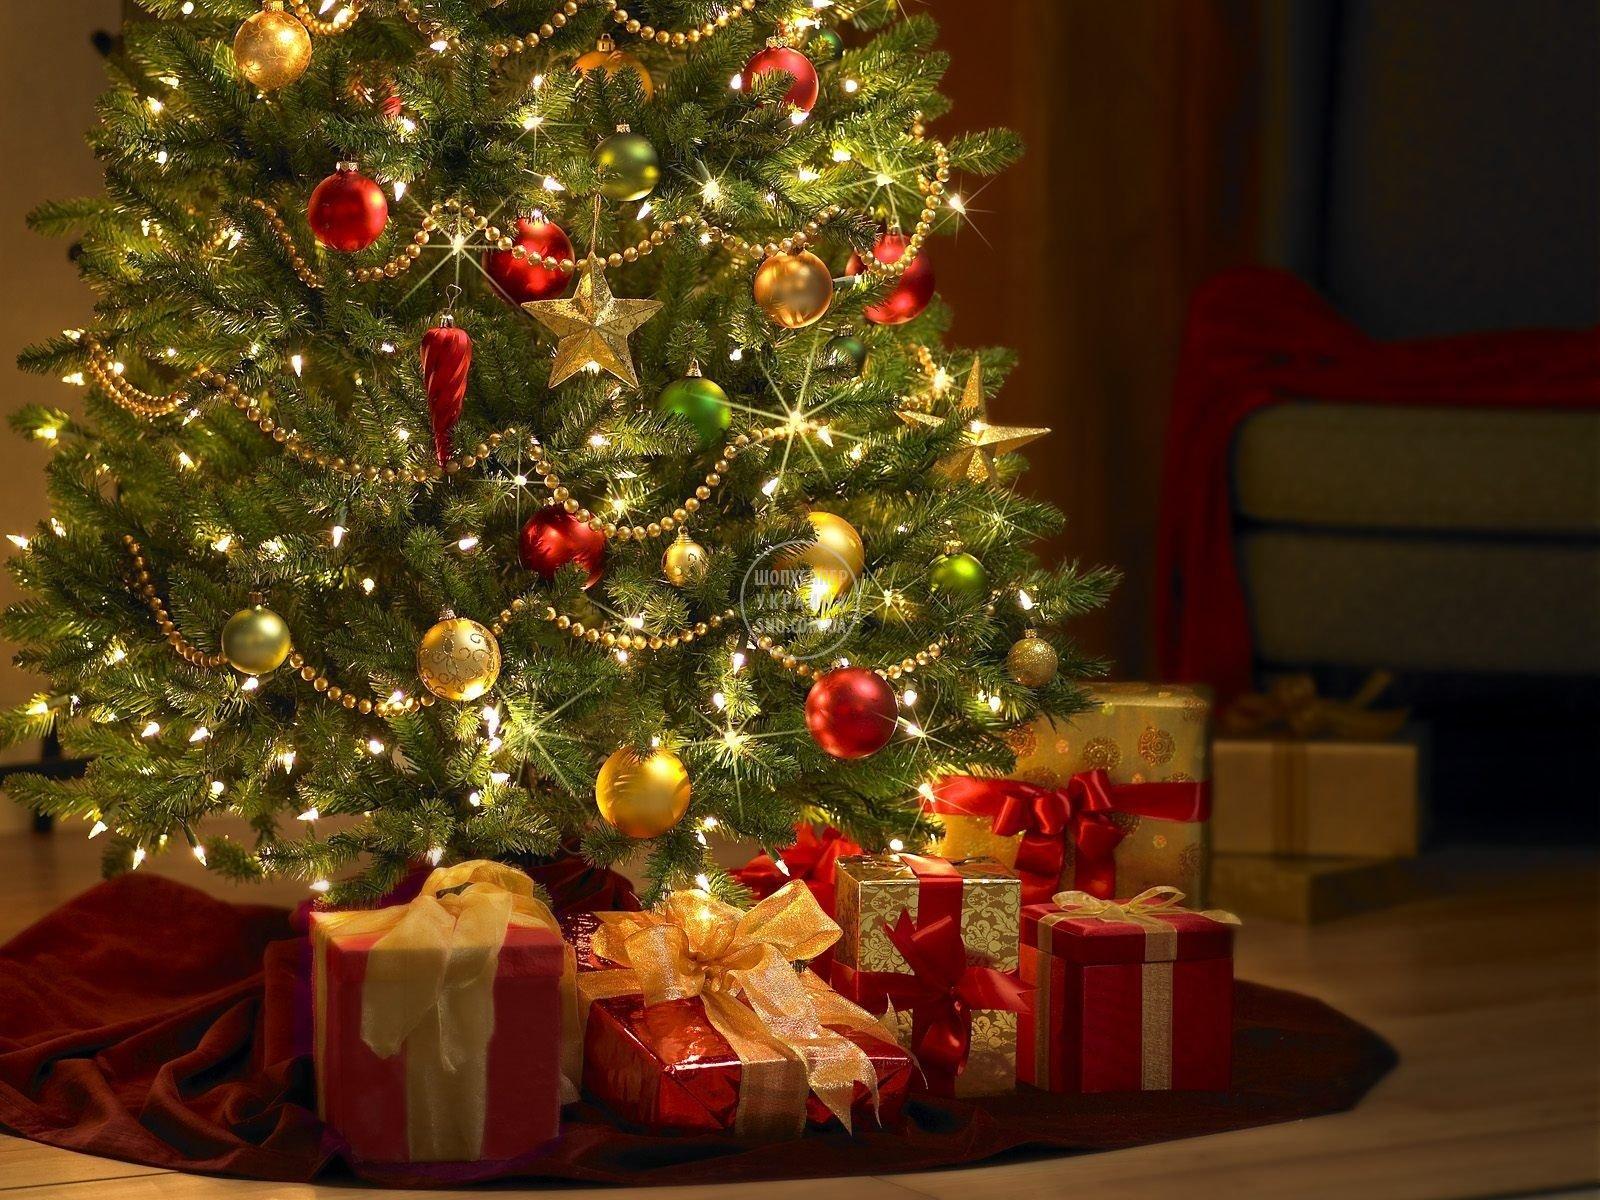 presents_under_the_tree.jpg